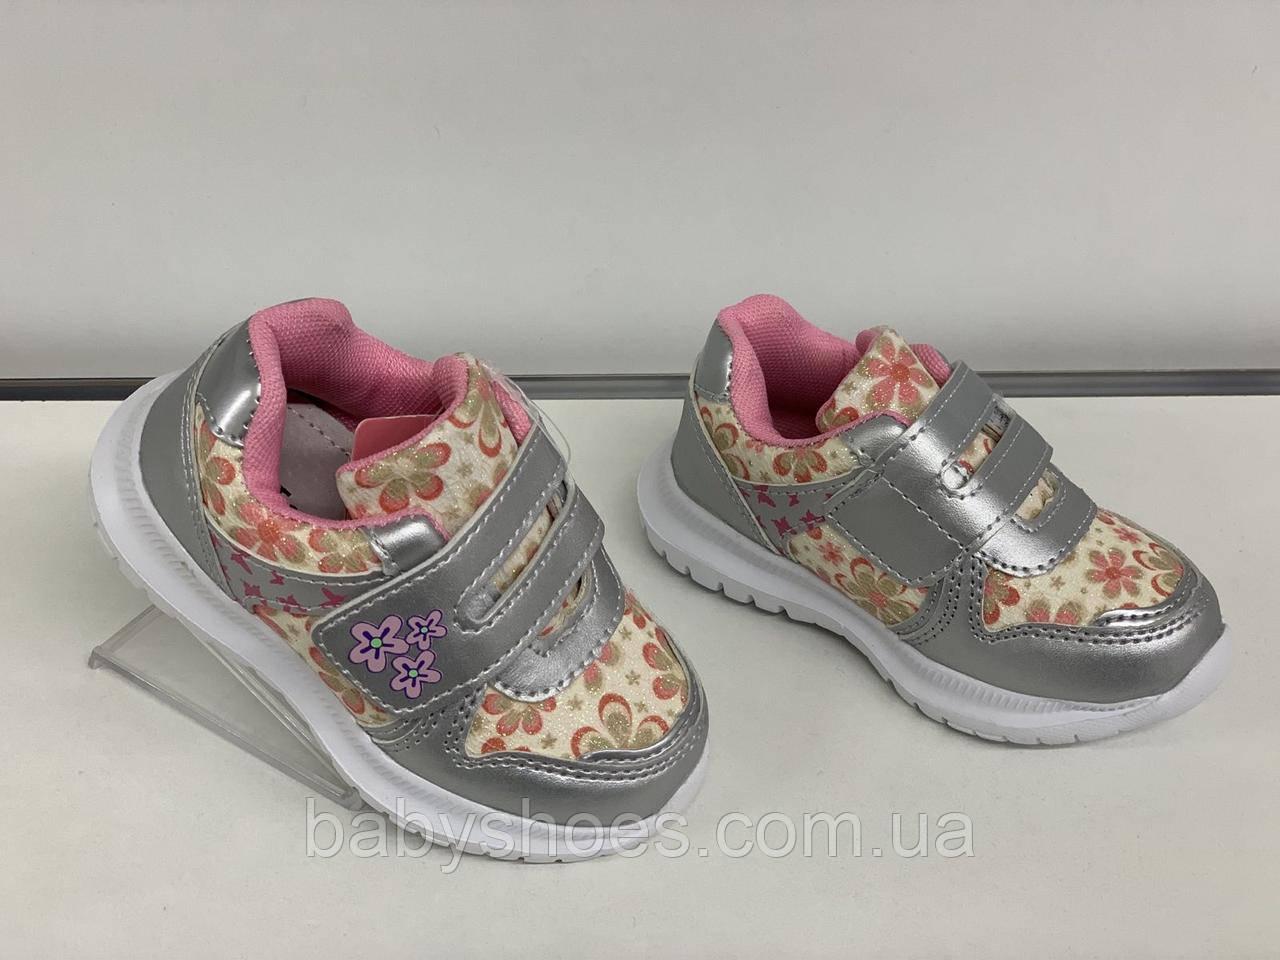 Кроссовки для девочки Tom.m  р. 21-26